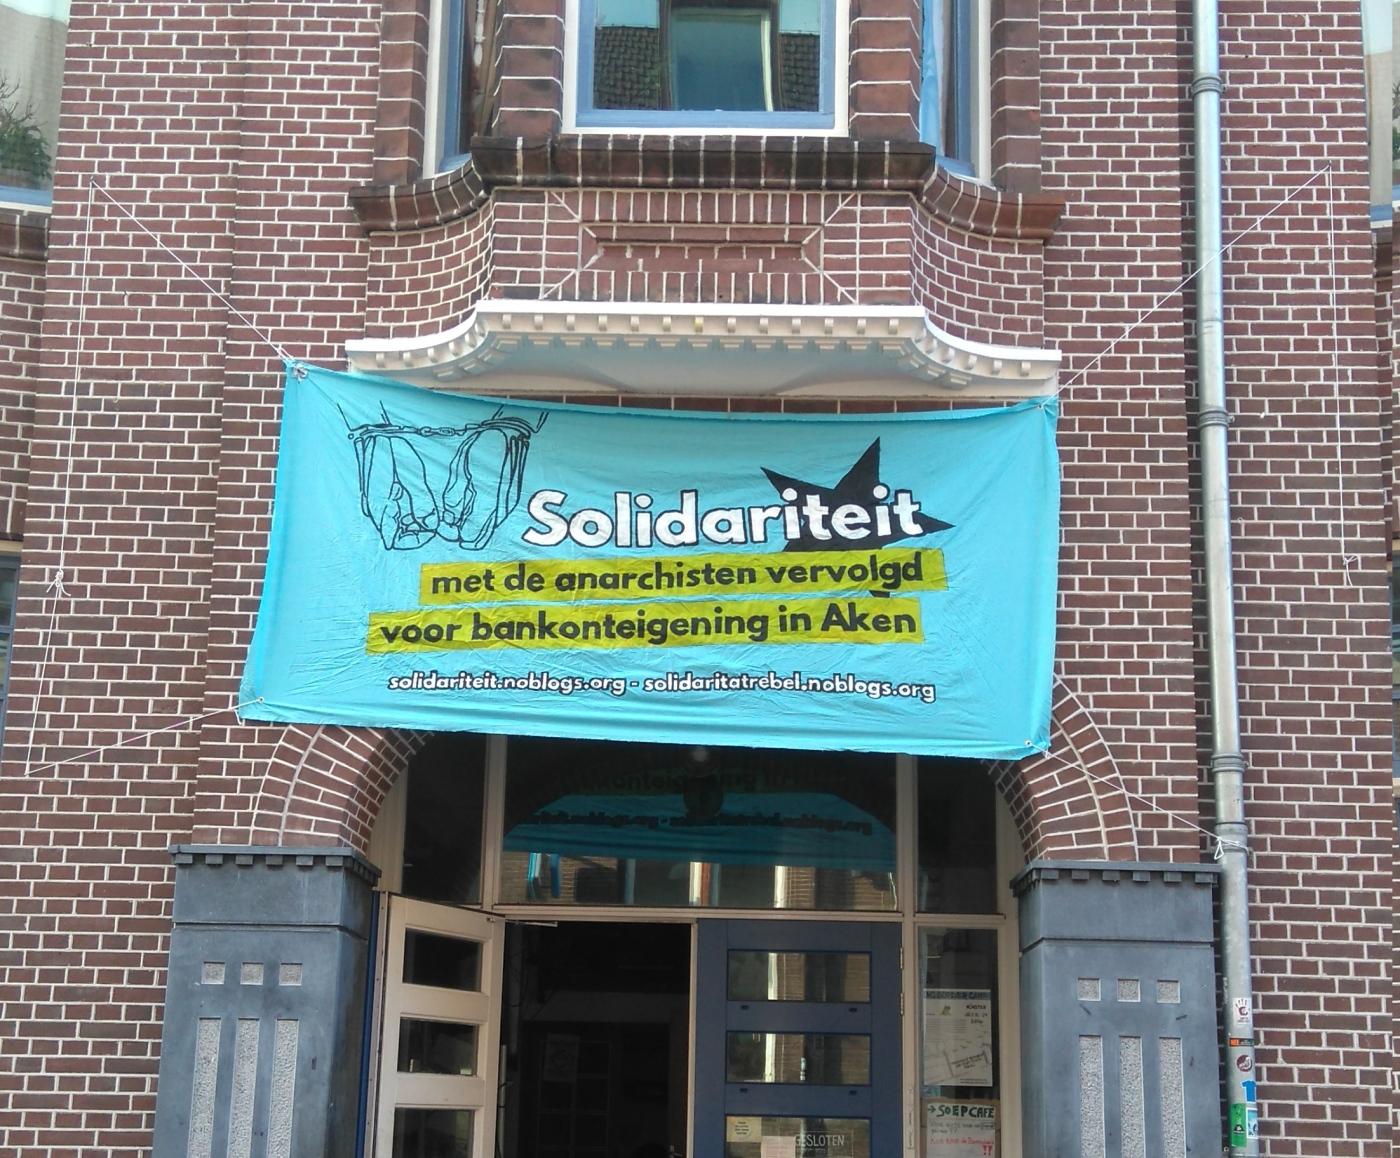 Solidariteit2